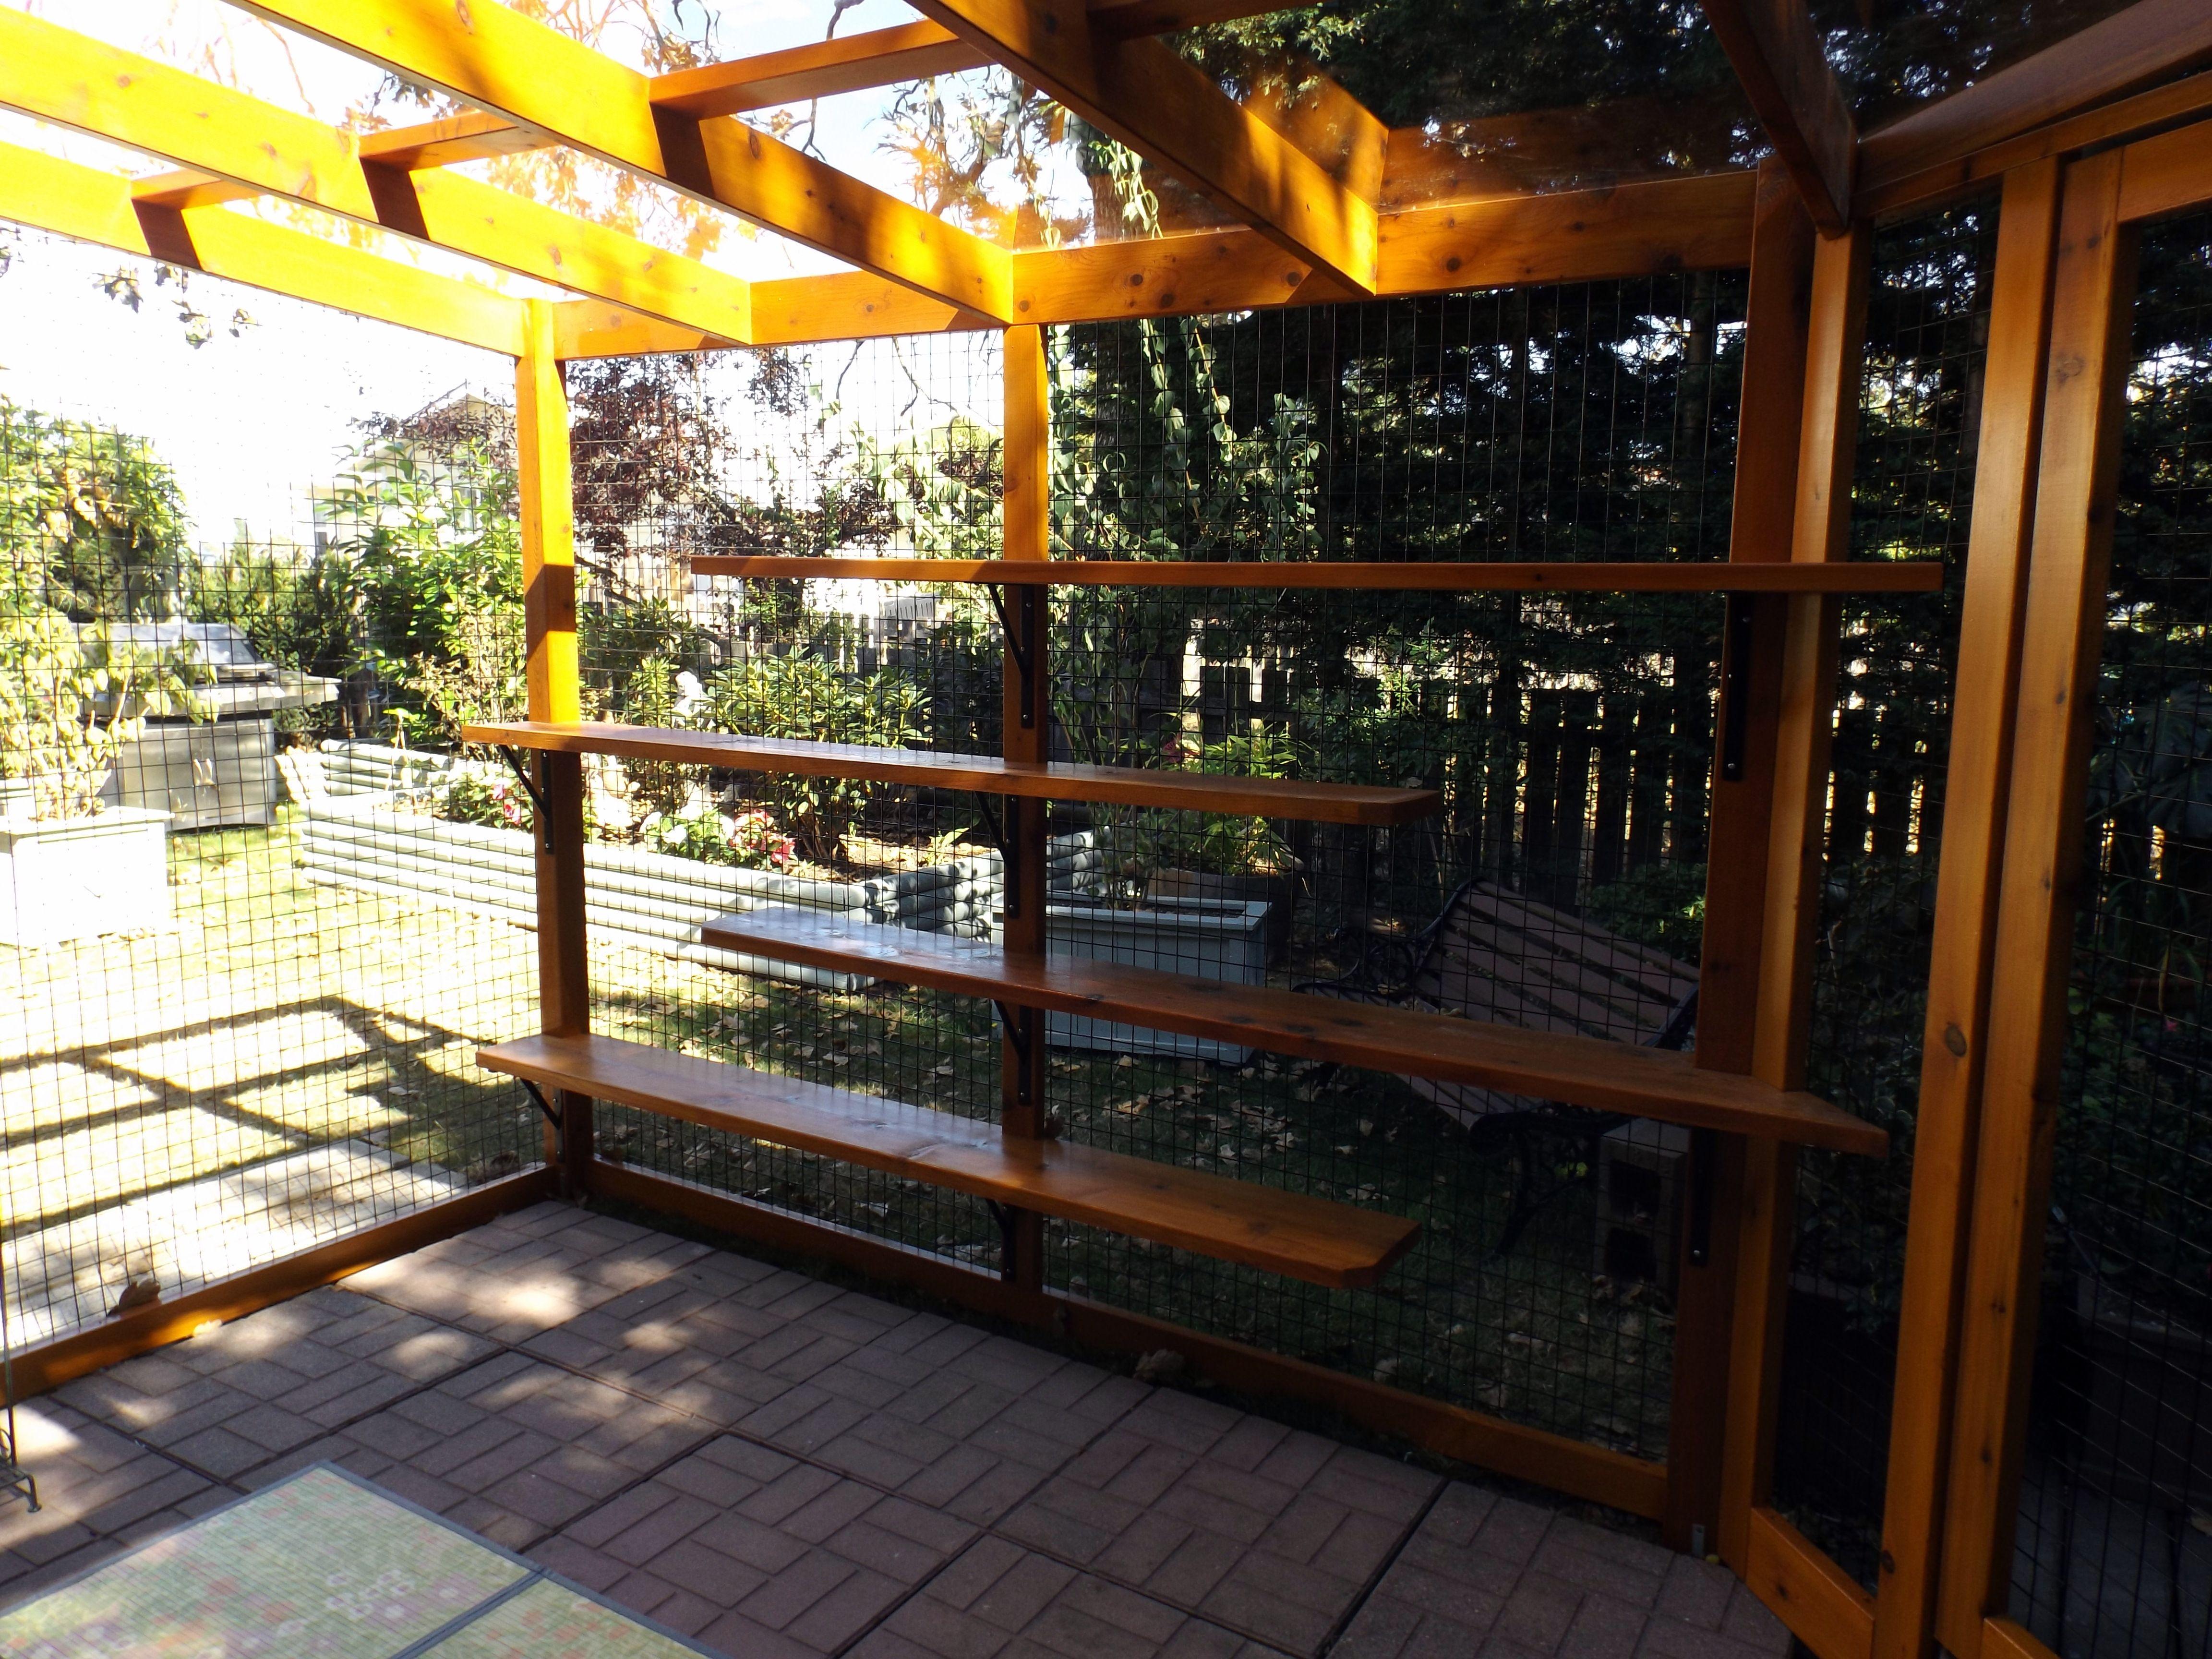 Sidney Cedar, A Patio Enclosure By Beautiful World Living Environments  Www.abeautifulworld.org